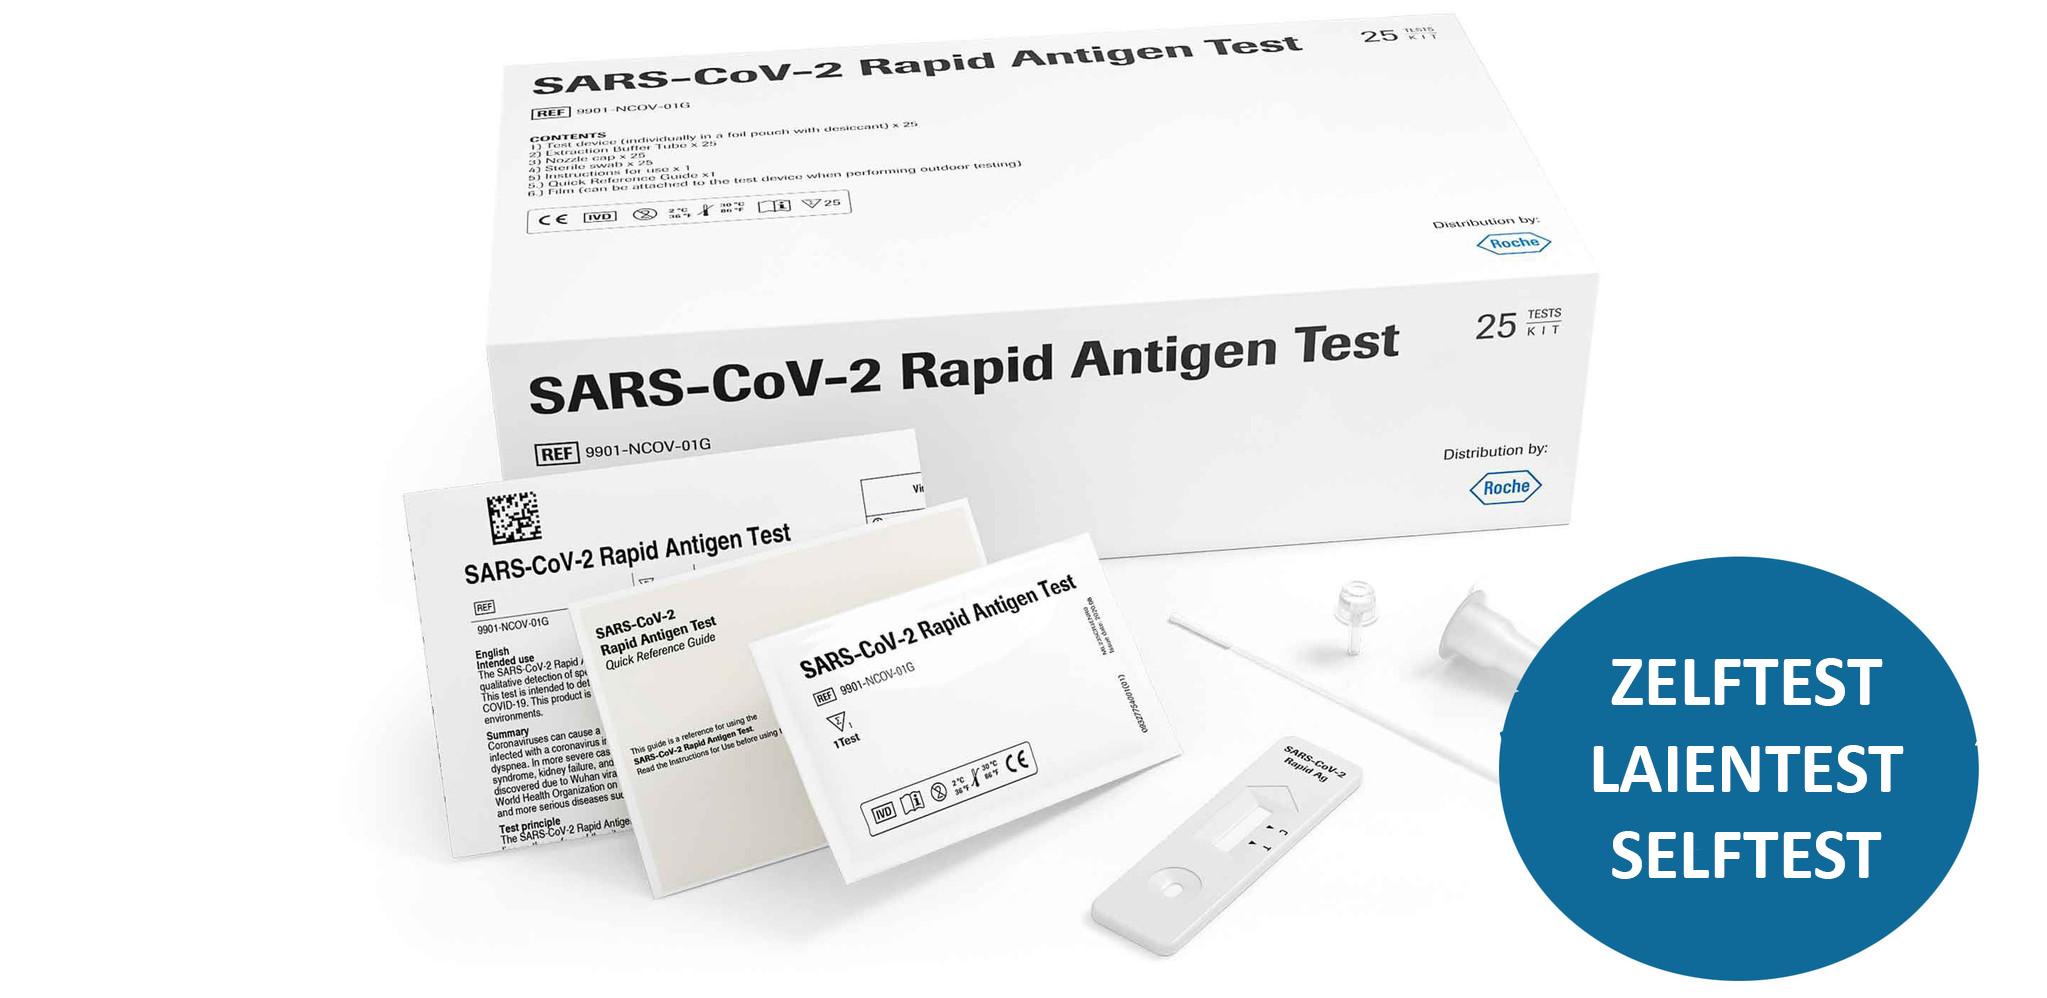 Corona Selbsttest privat 1 Stück, Roche Corona-Antigen-Test, Nasentupfer - Laientest